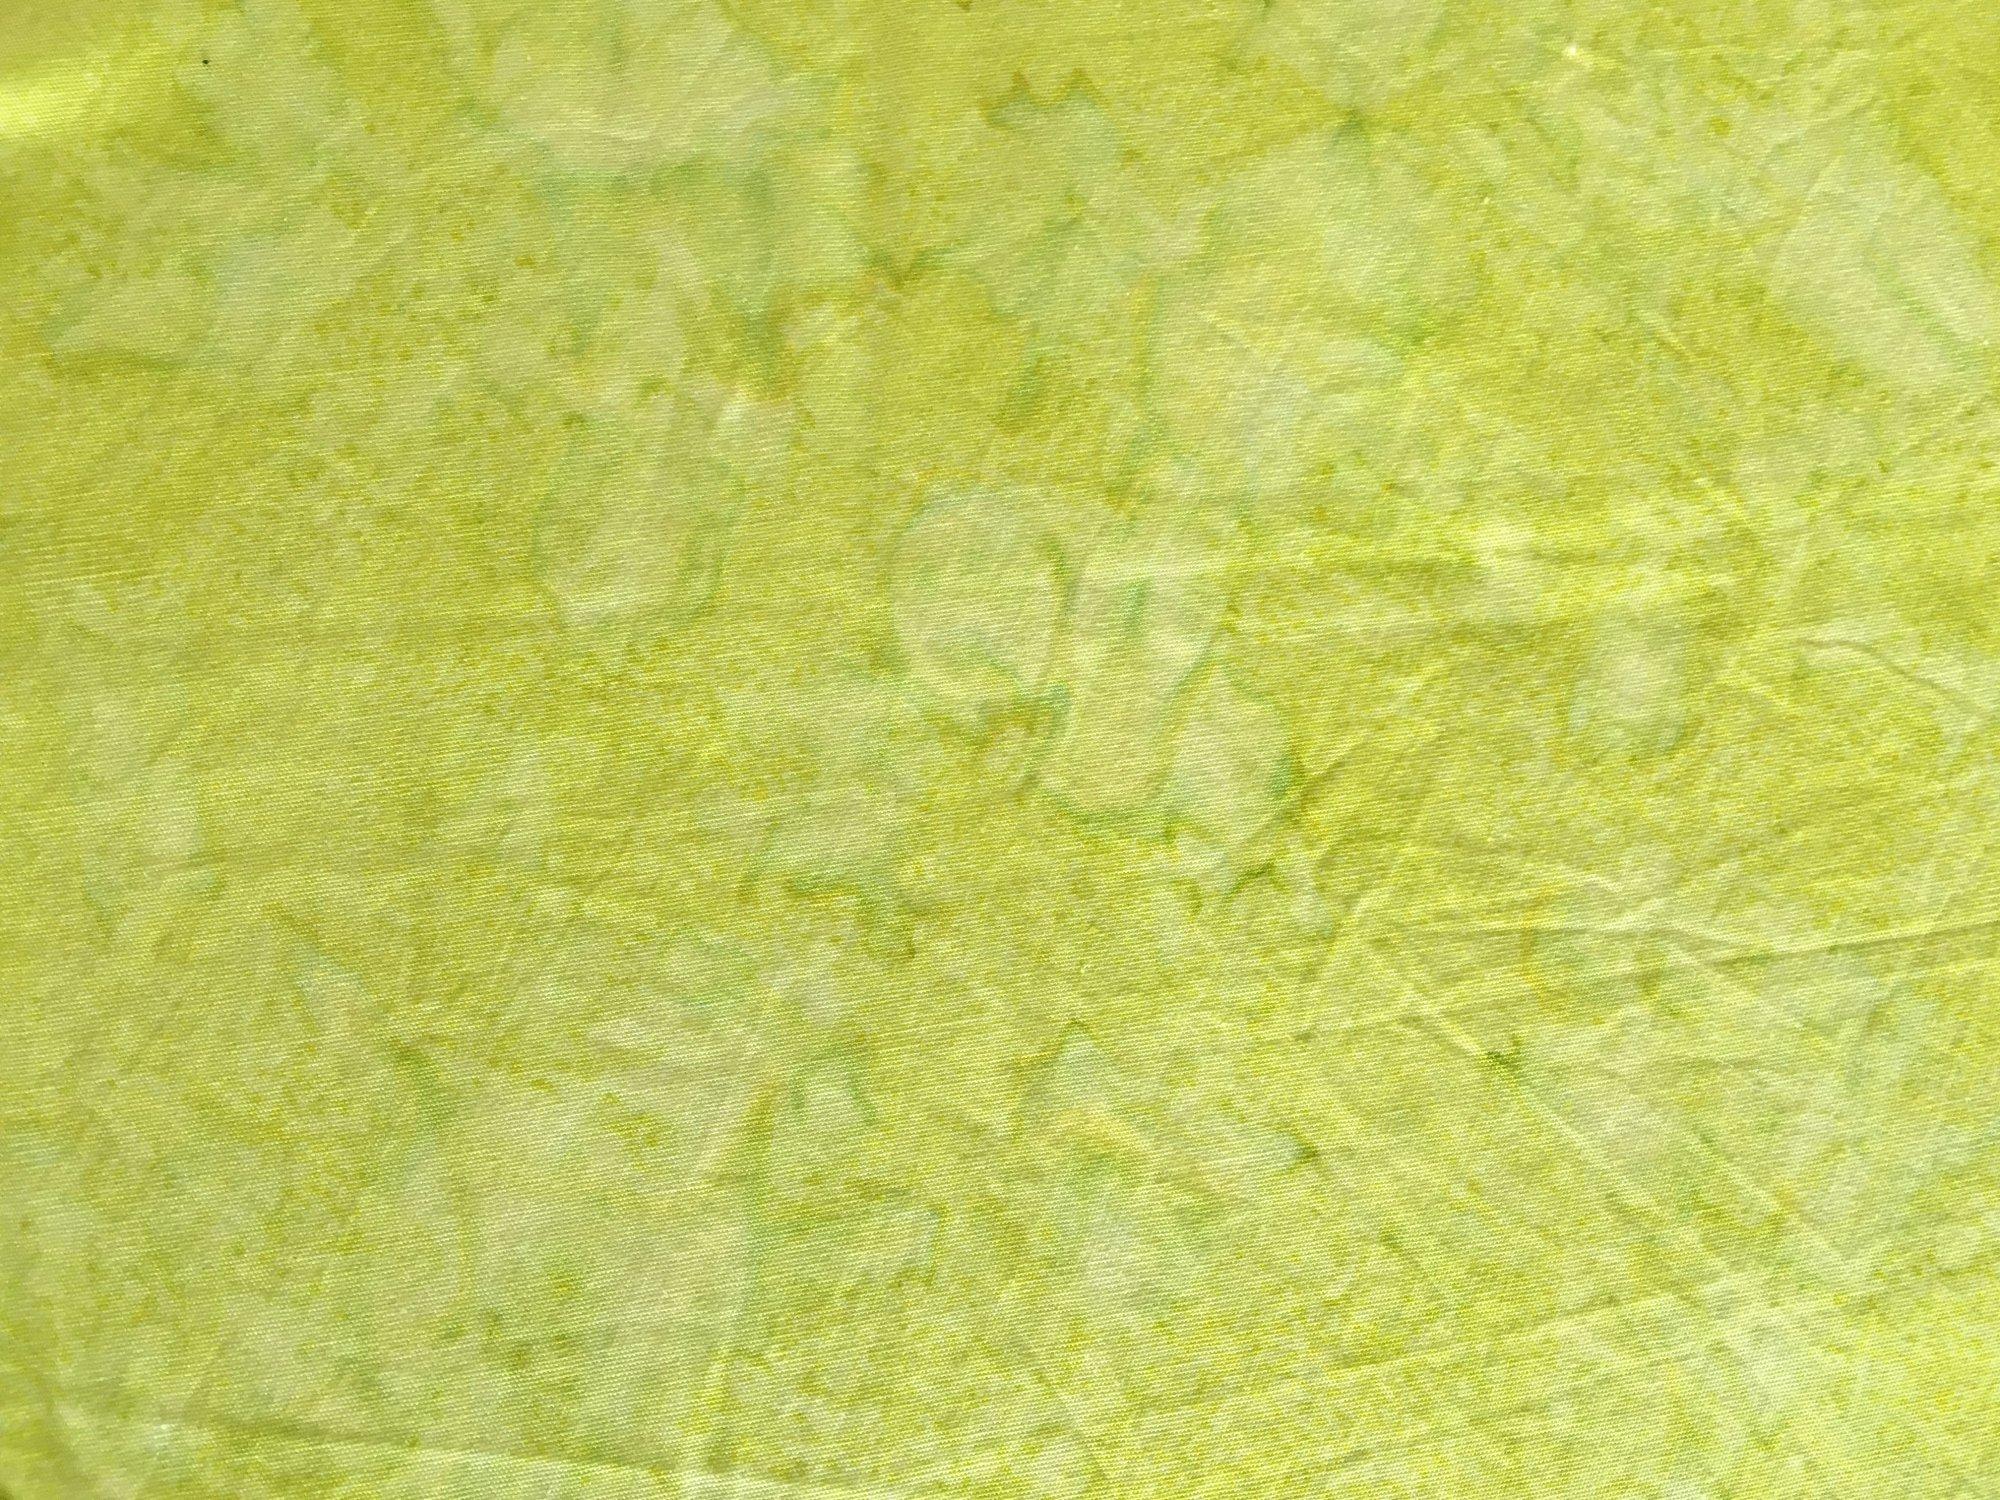 BATIK TONAL CRUSH CITRUS 72KI040 Fabrics That Care